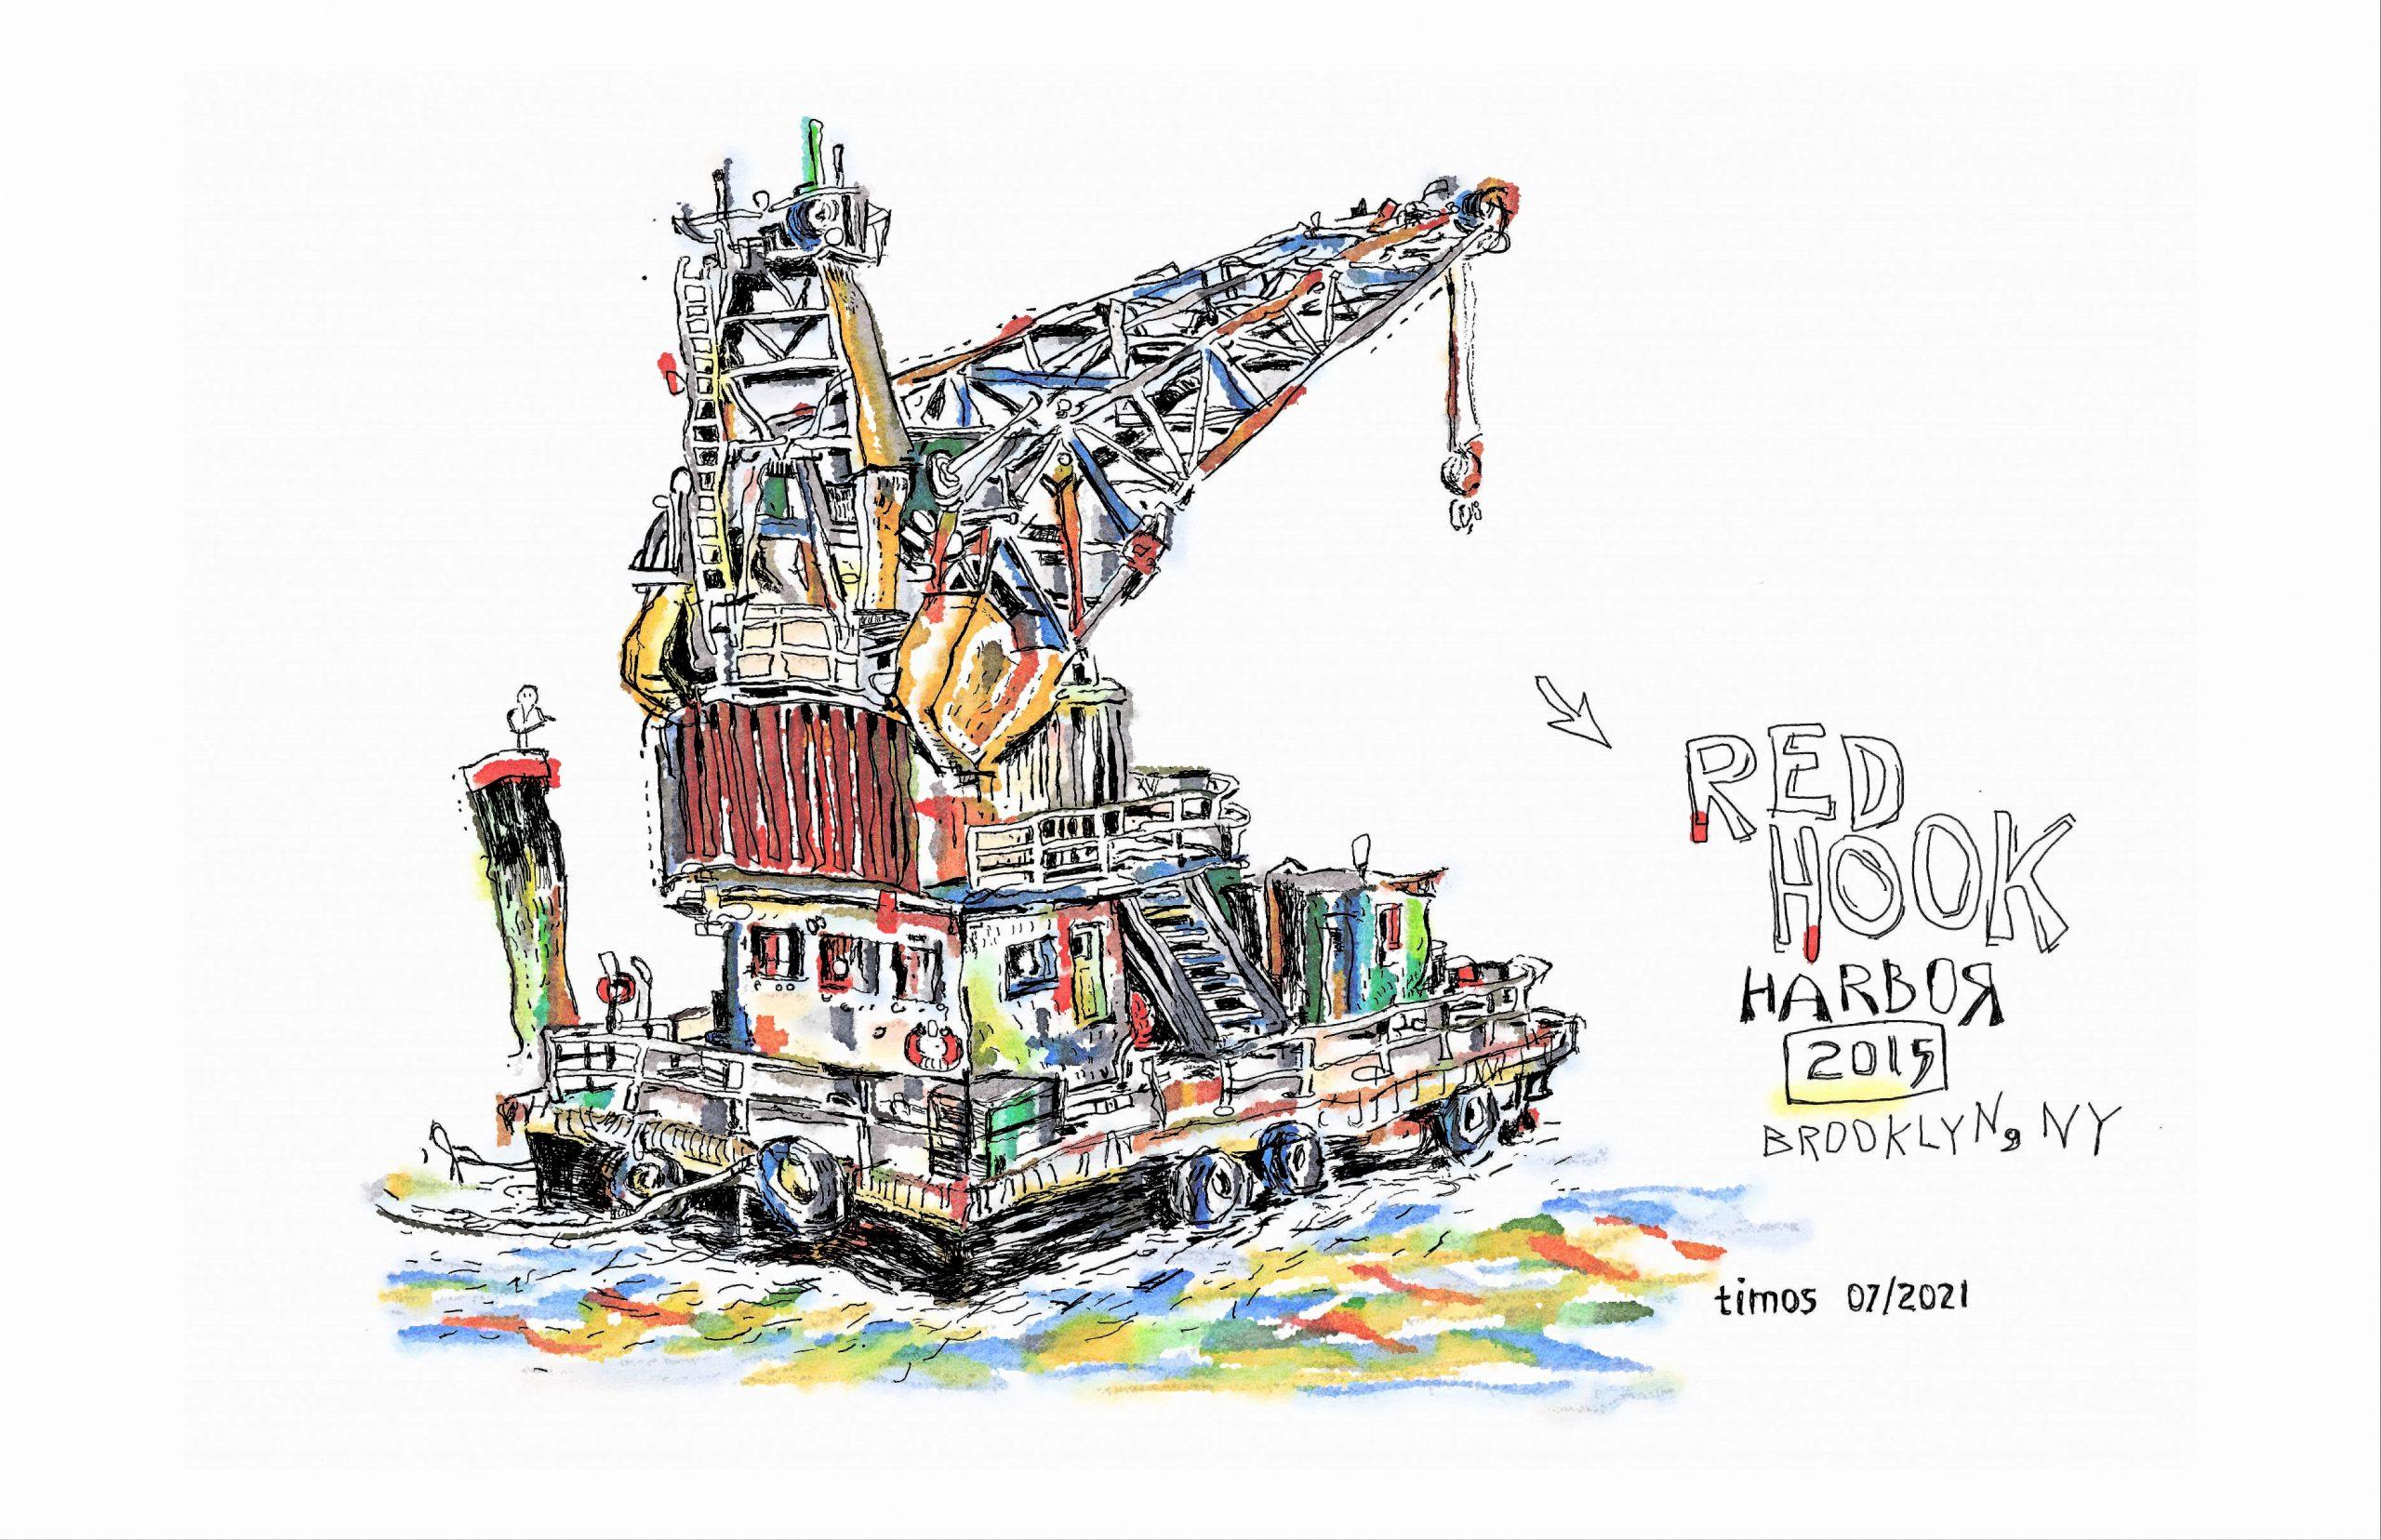 Red Hook harbor | 07.26.2021